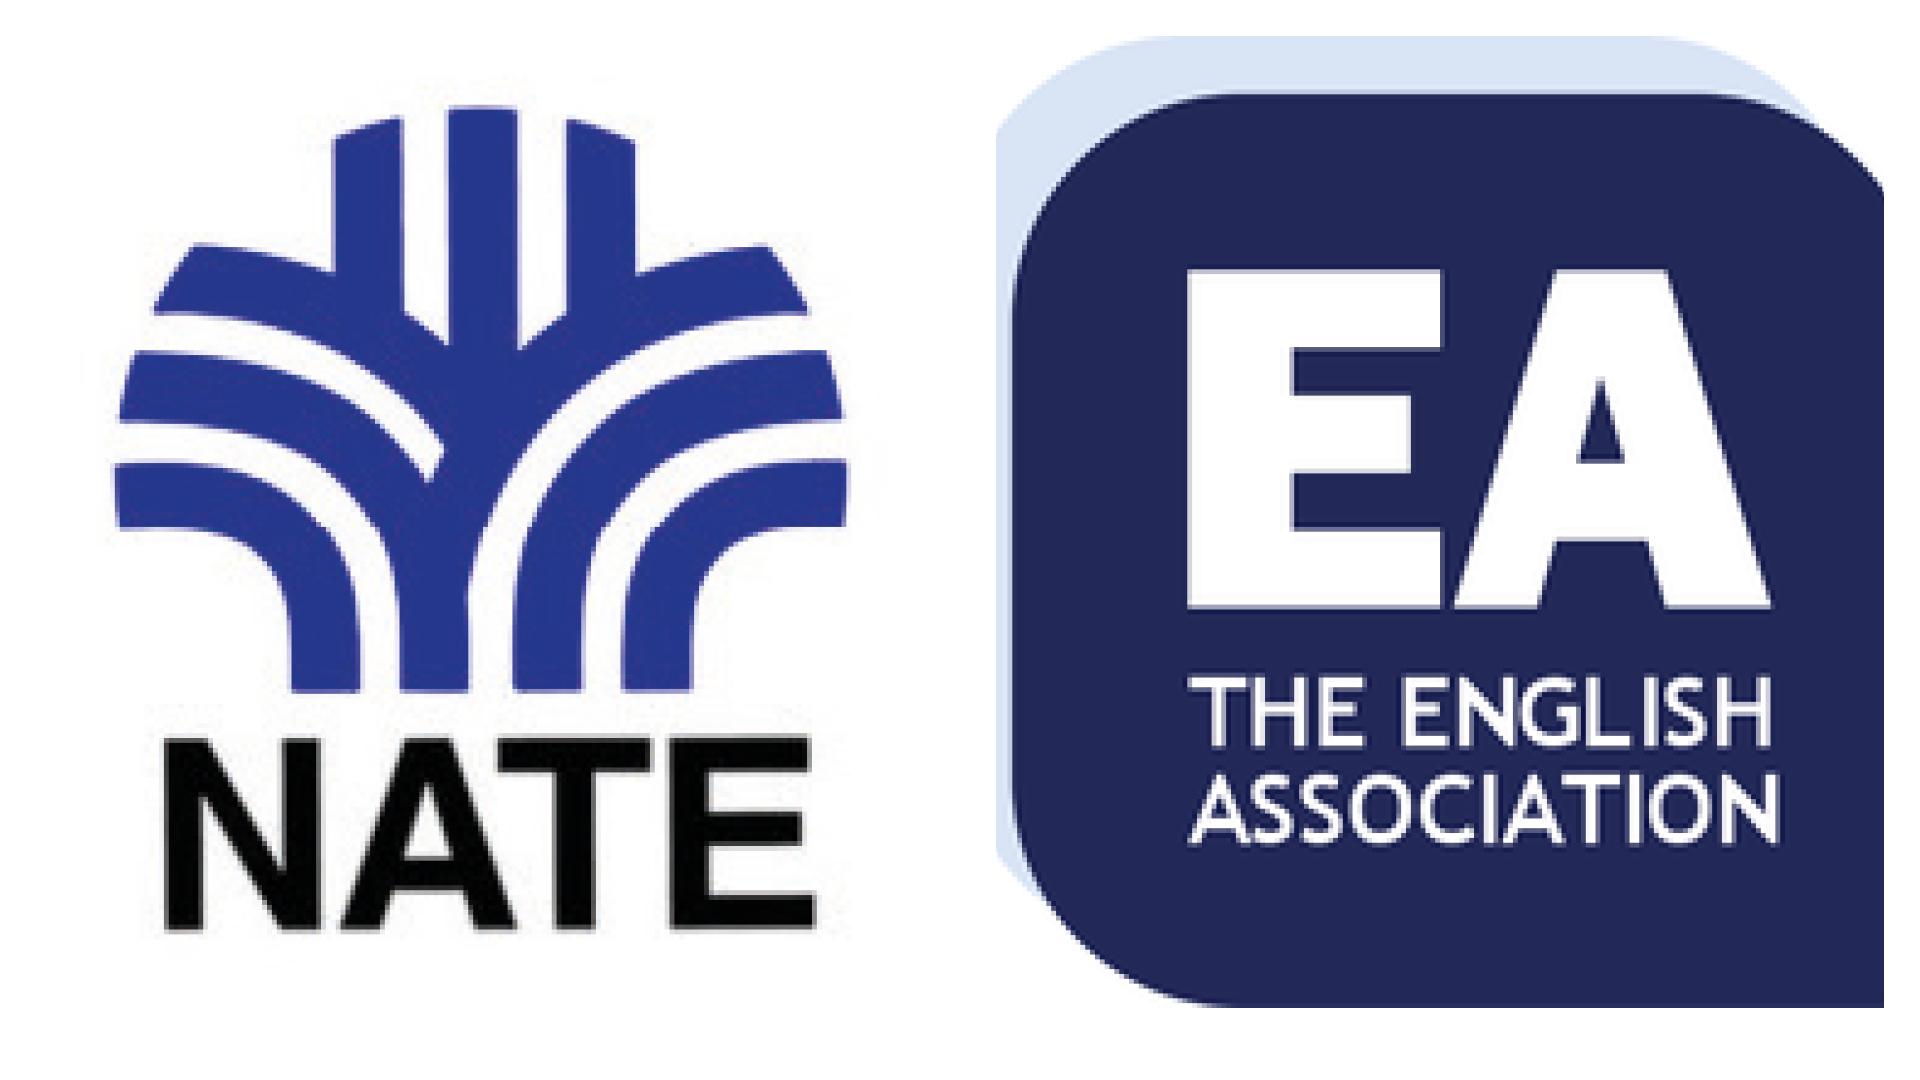 nate ea initial cuts statement teacher training bursary association bursaries regarding